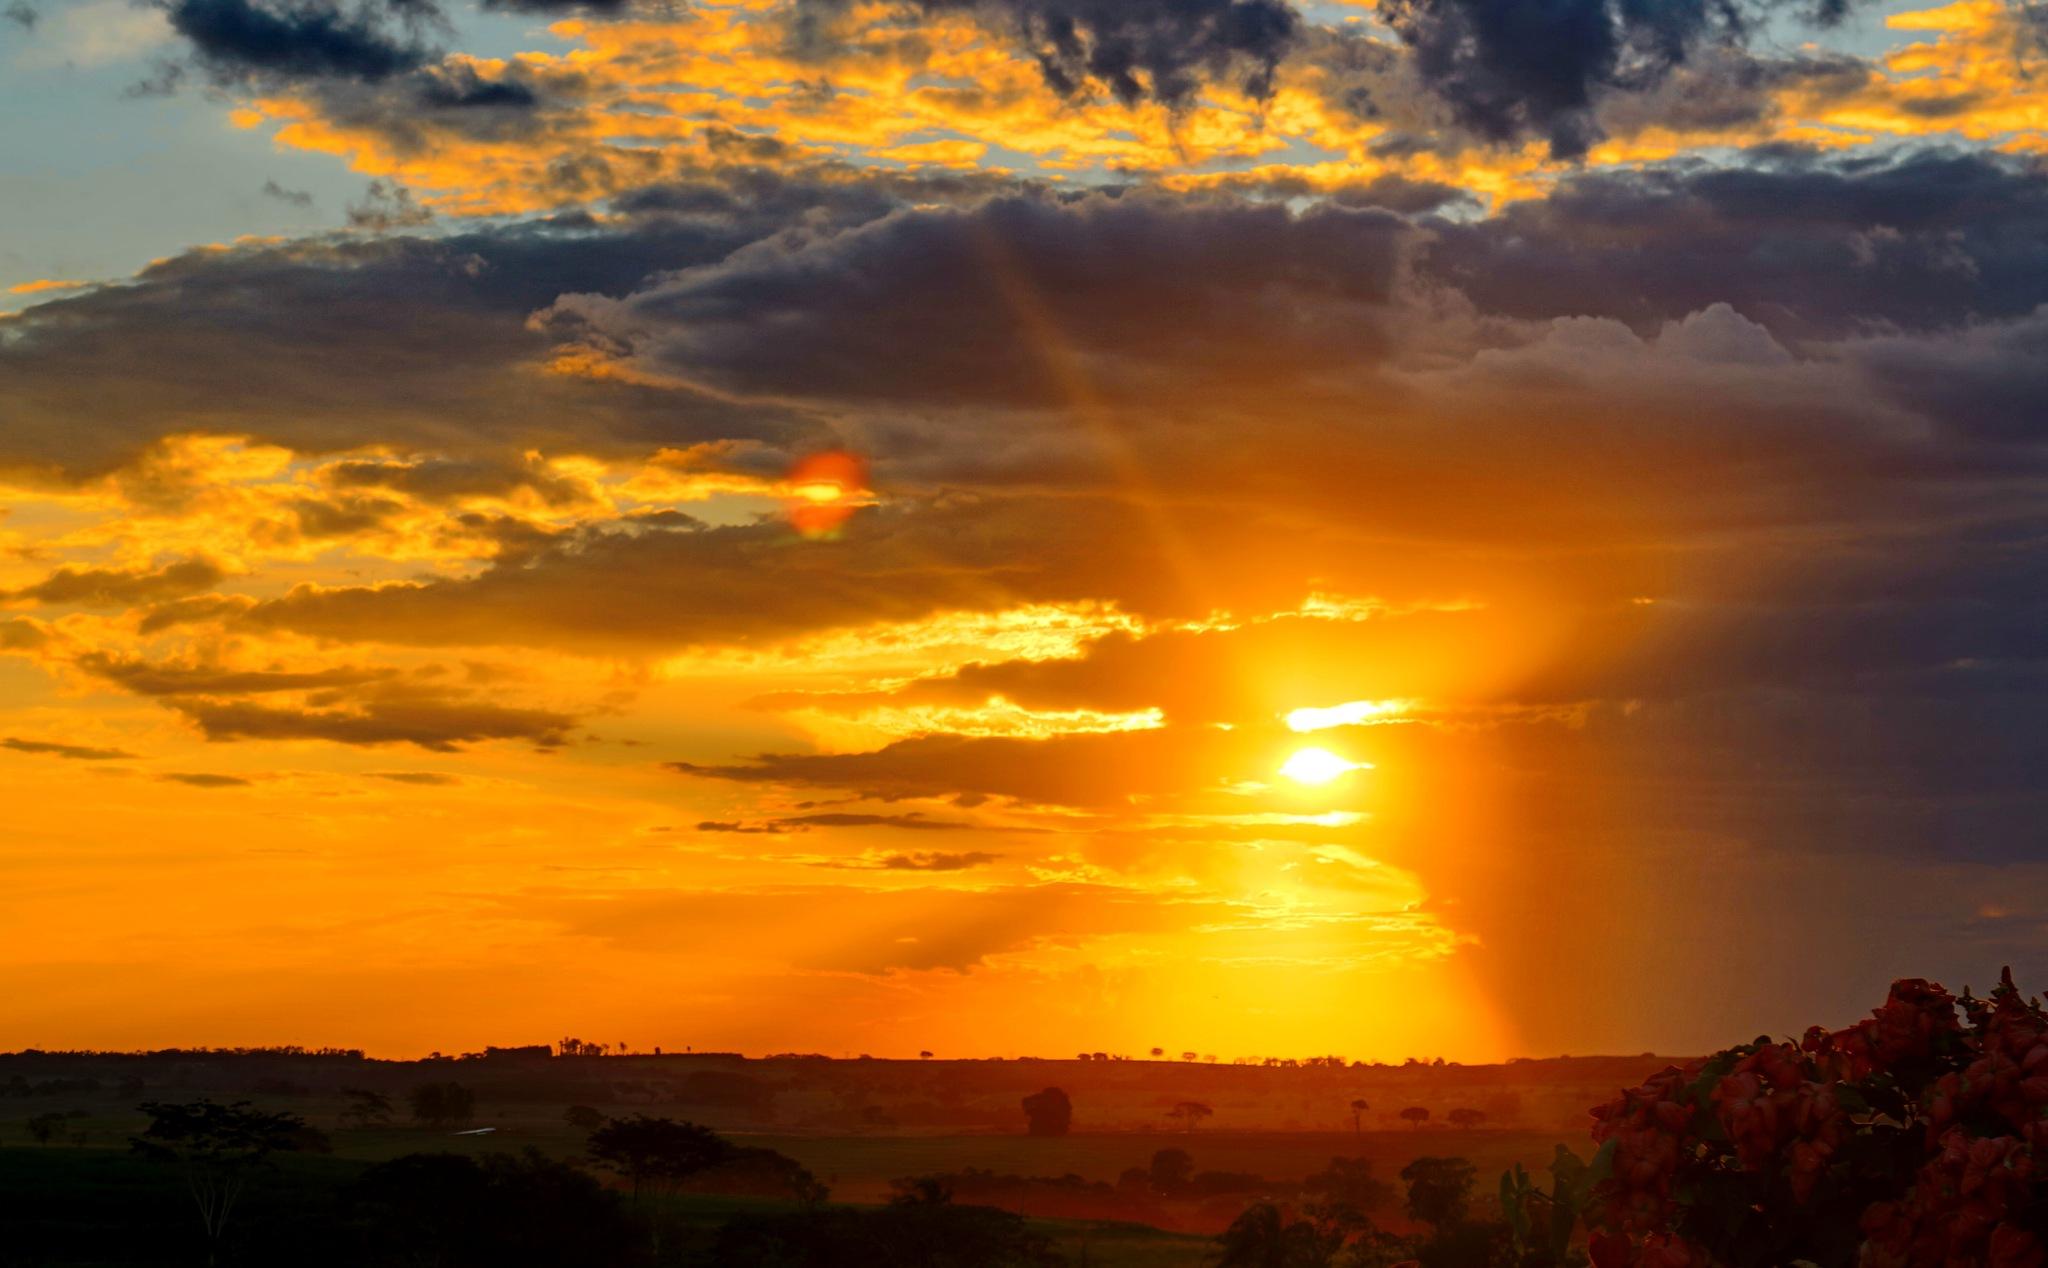 Sunset on the farm. by Nestor